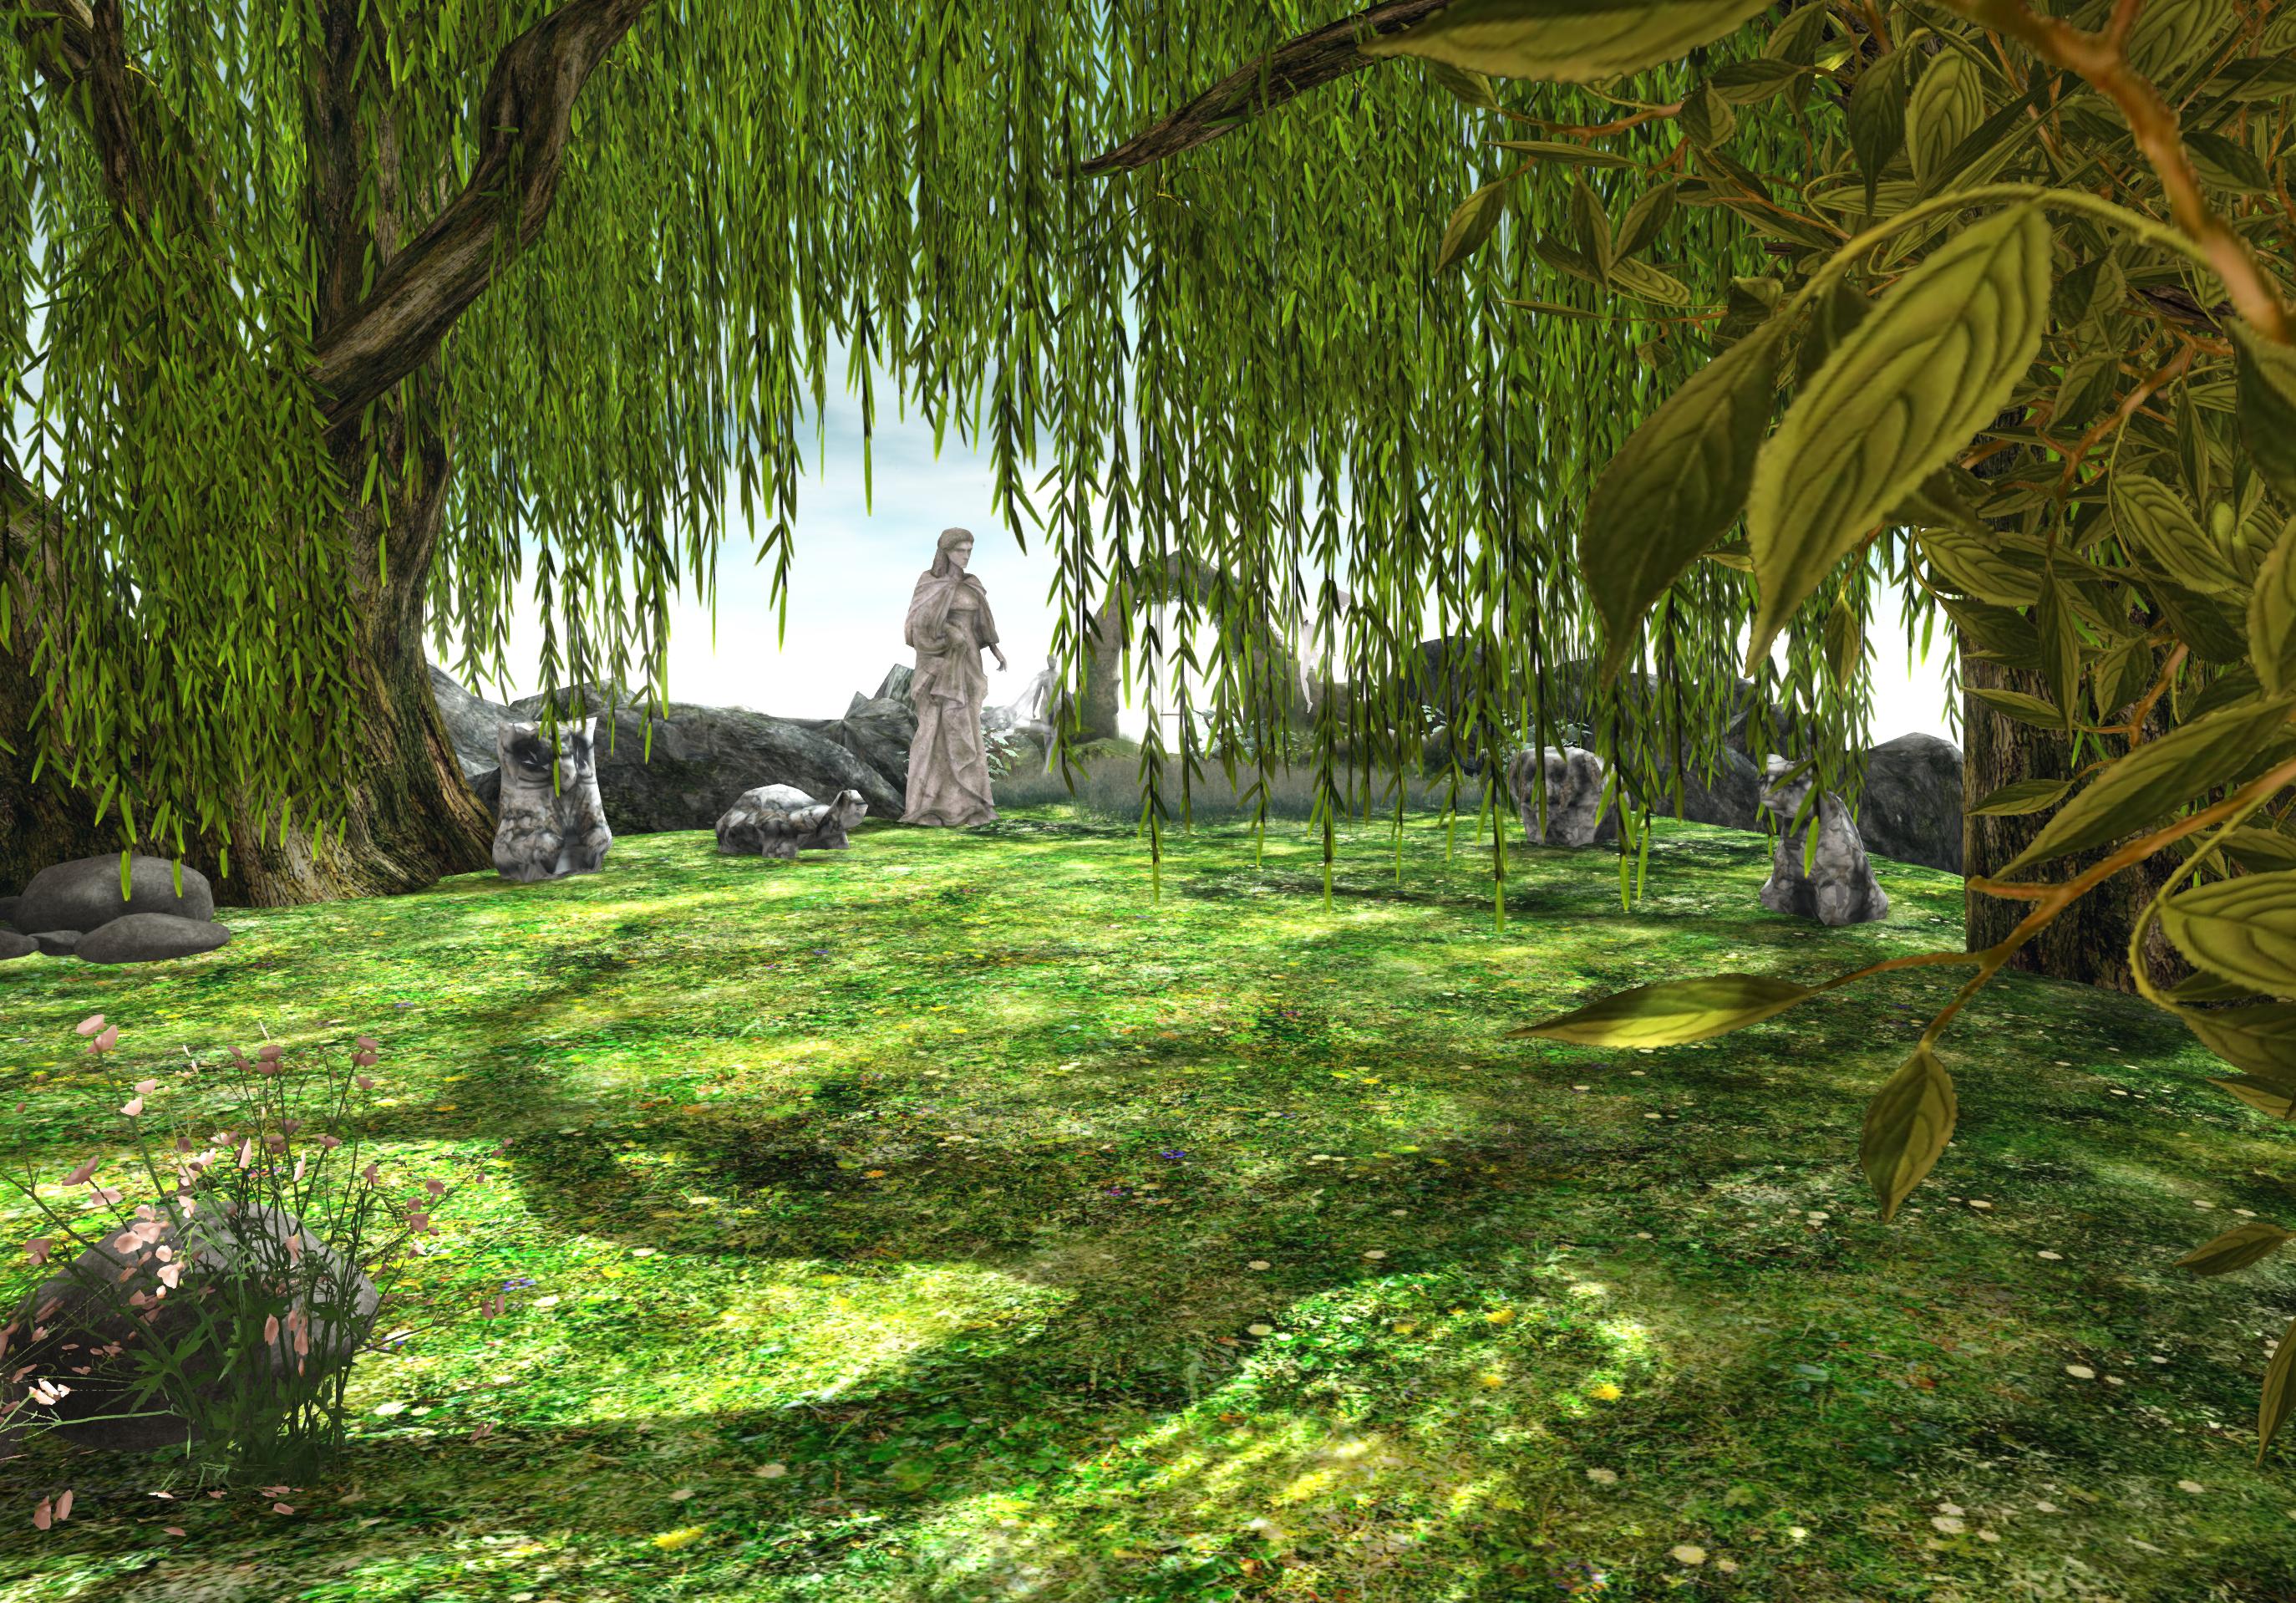 Charmant Serenity Garden